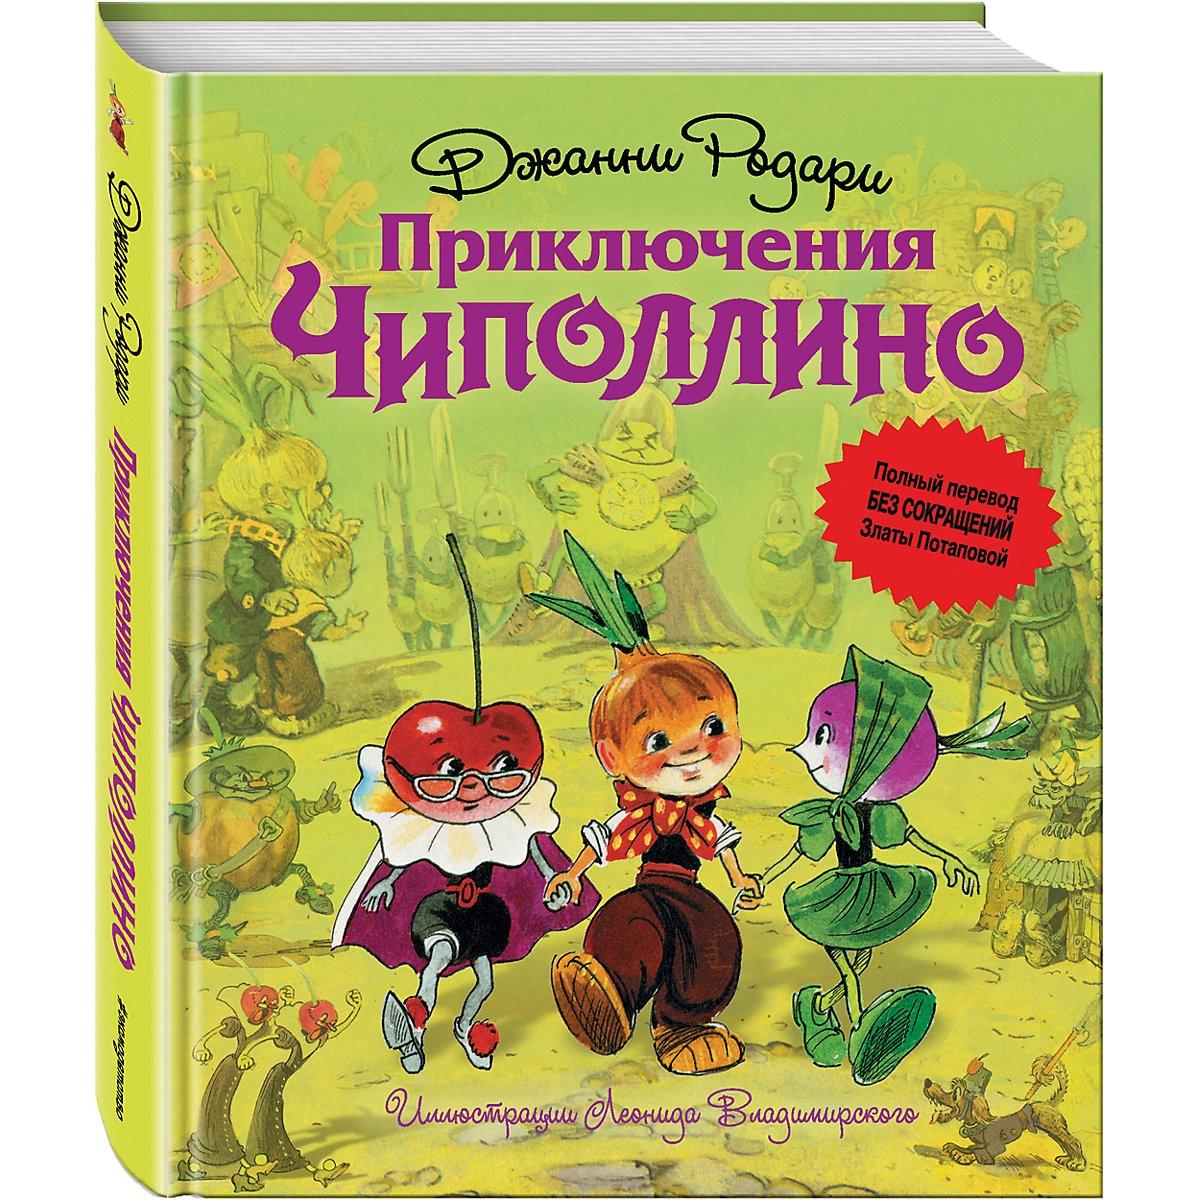 Books EKSMO 4235946 Children Education Encyclopedia Alphabet Dictionary Book For Baby MTpromo